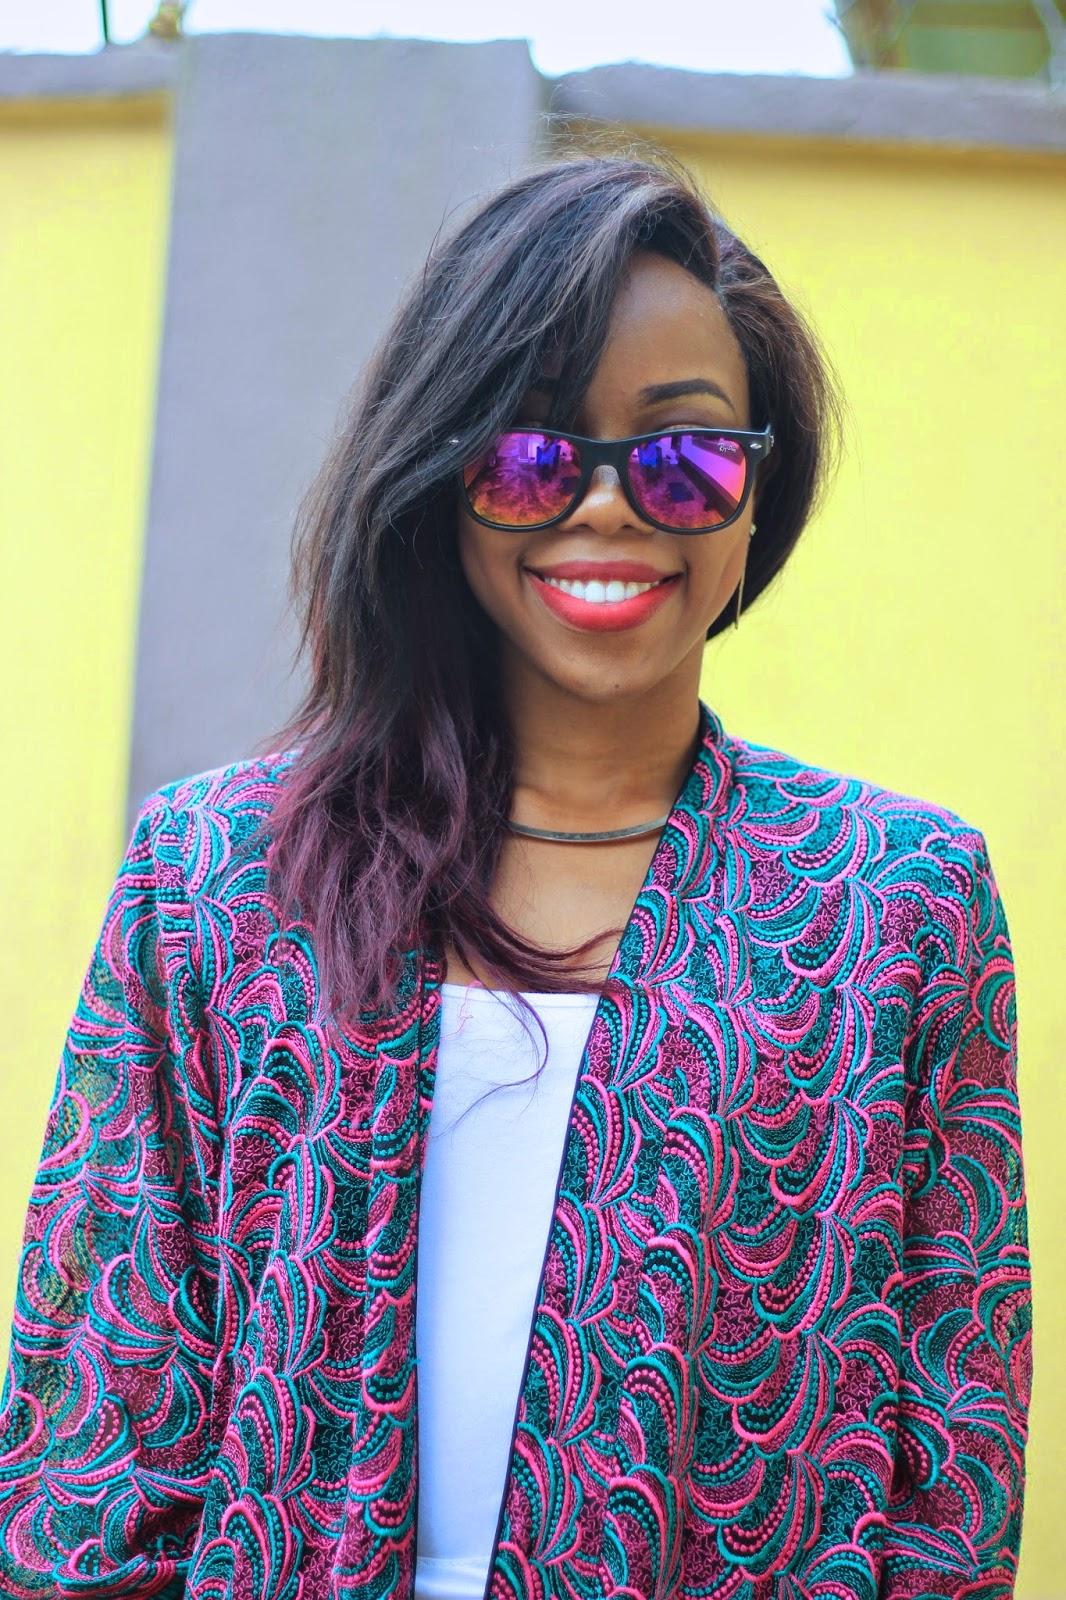 Sunglasses by Valentine Okolo